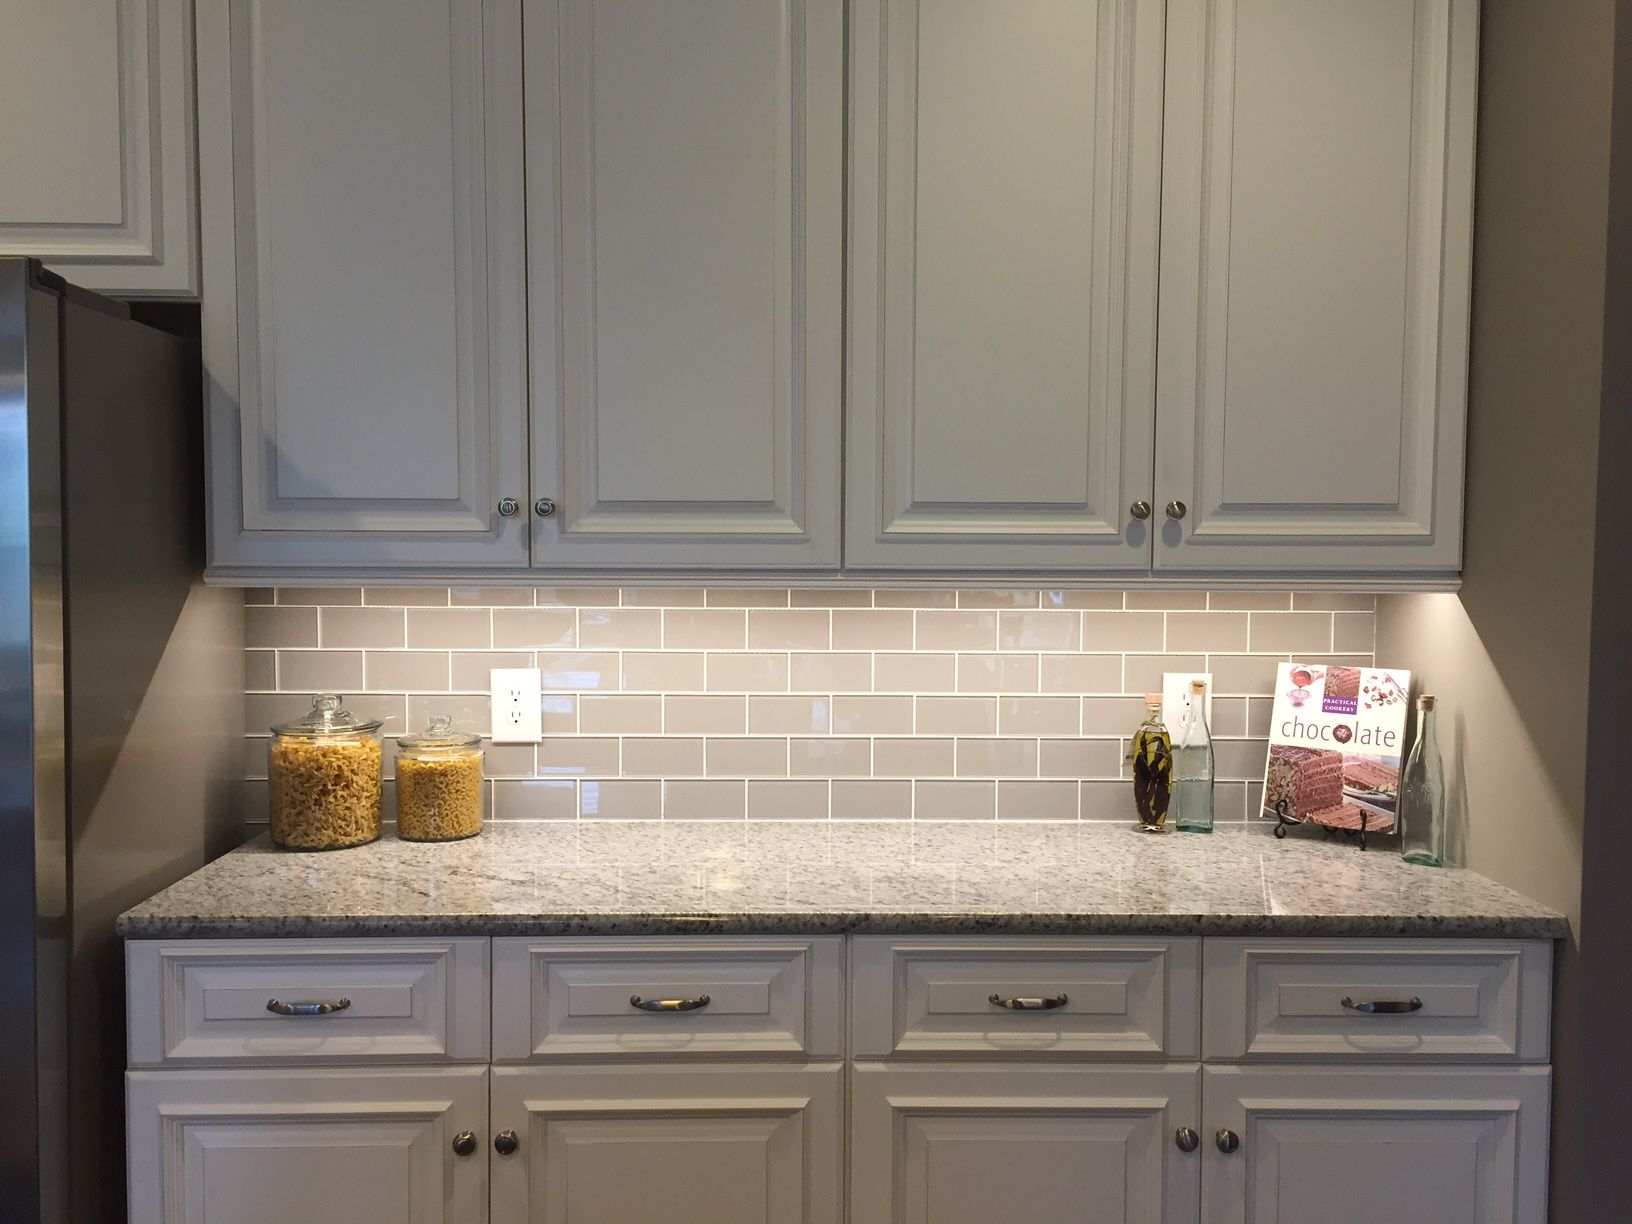 Glass Kitchen Backsplash Dash Appliances Smoke Subway Tile Backsplashes Pinterest